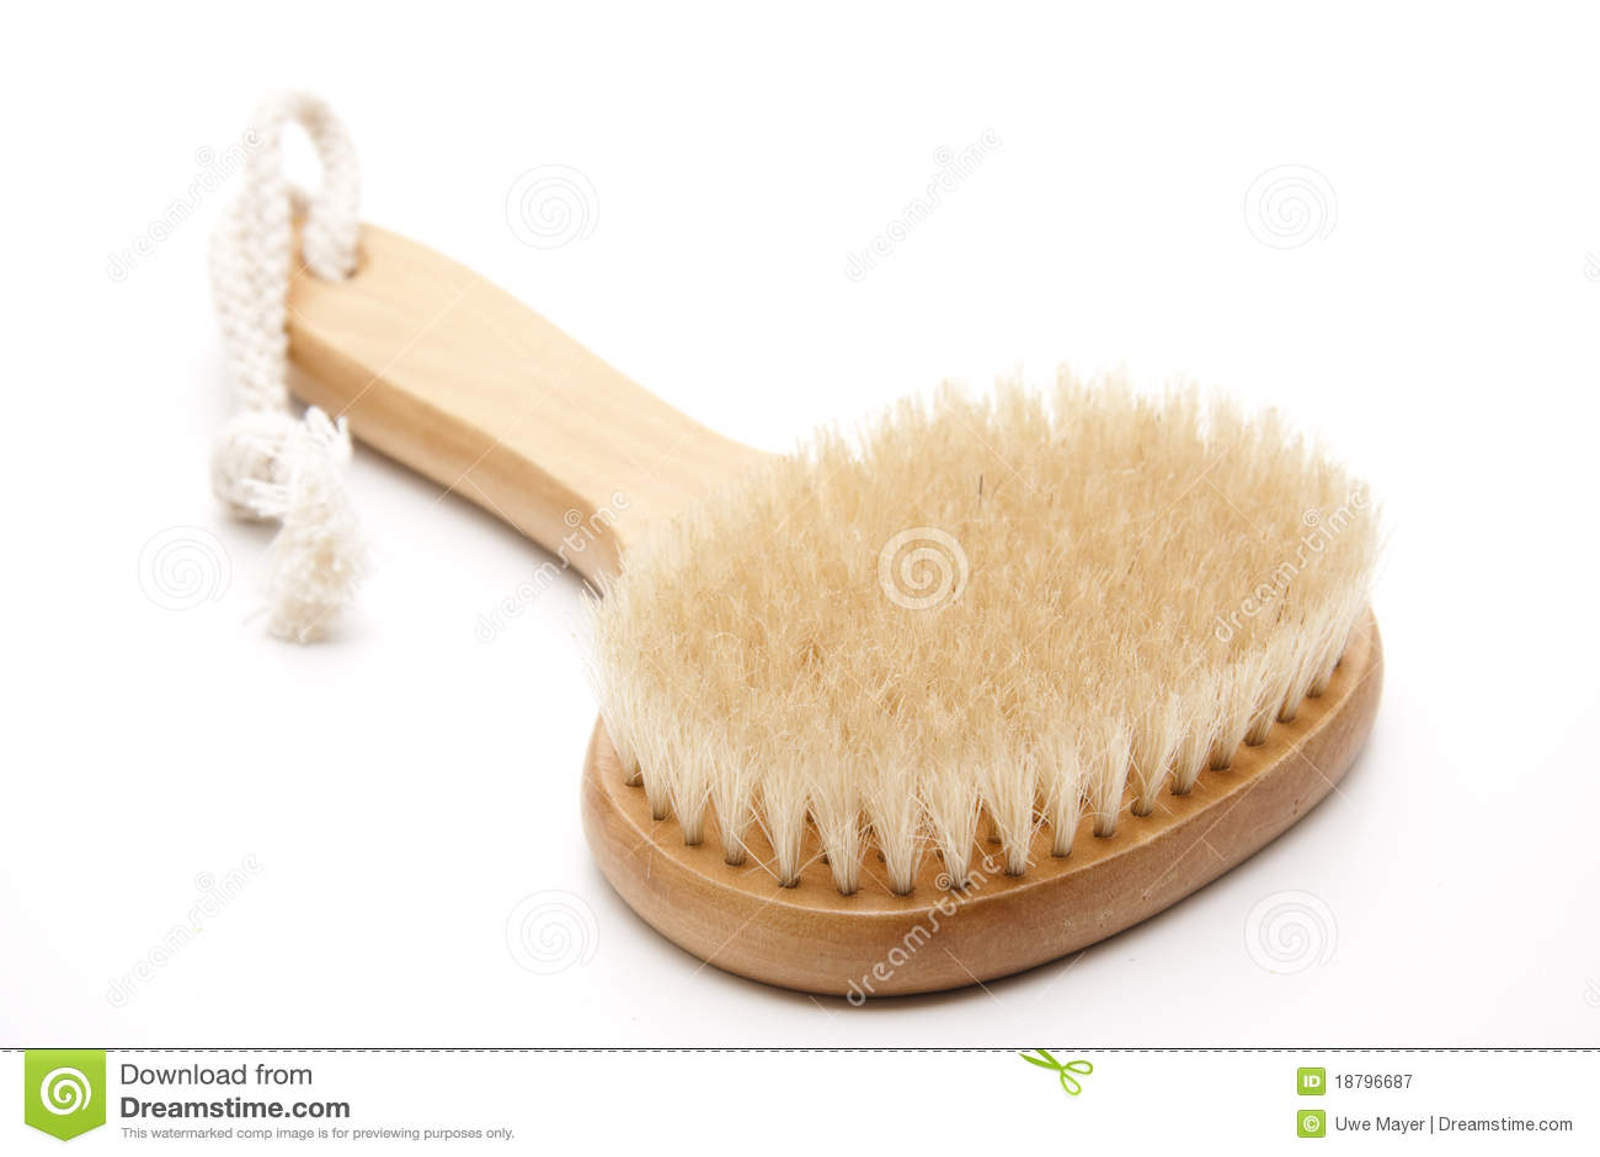 Massage brush with bristles